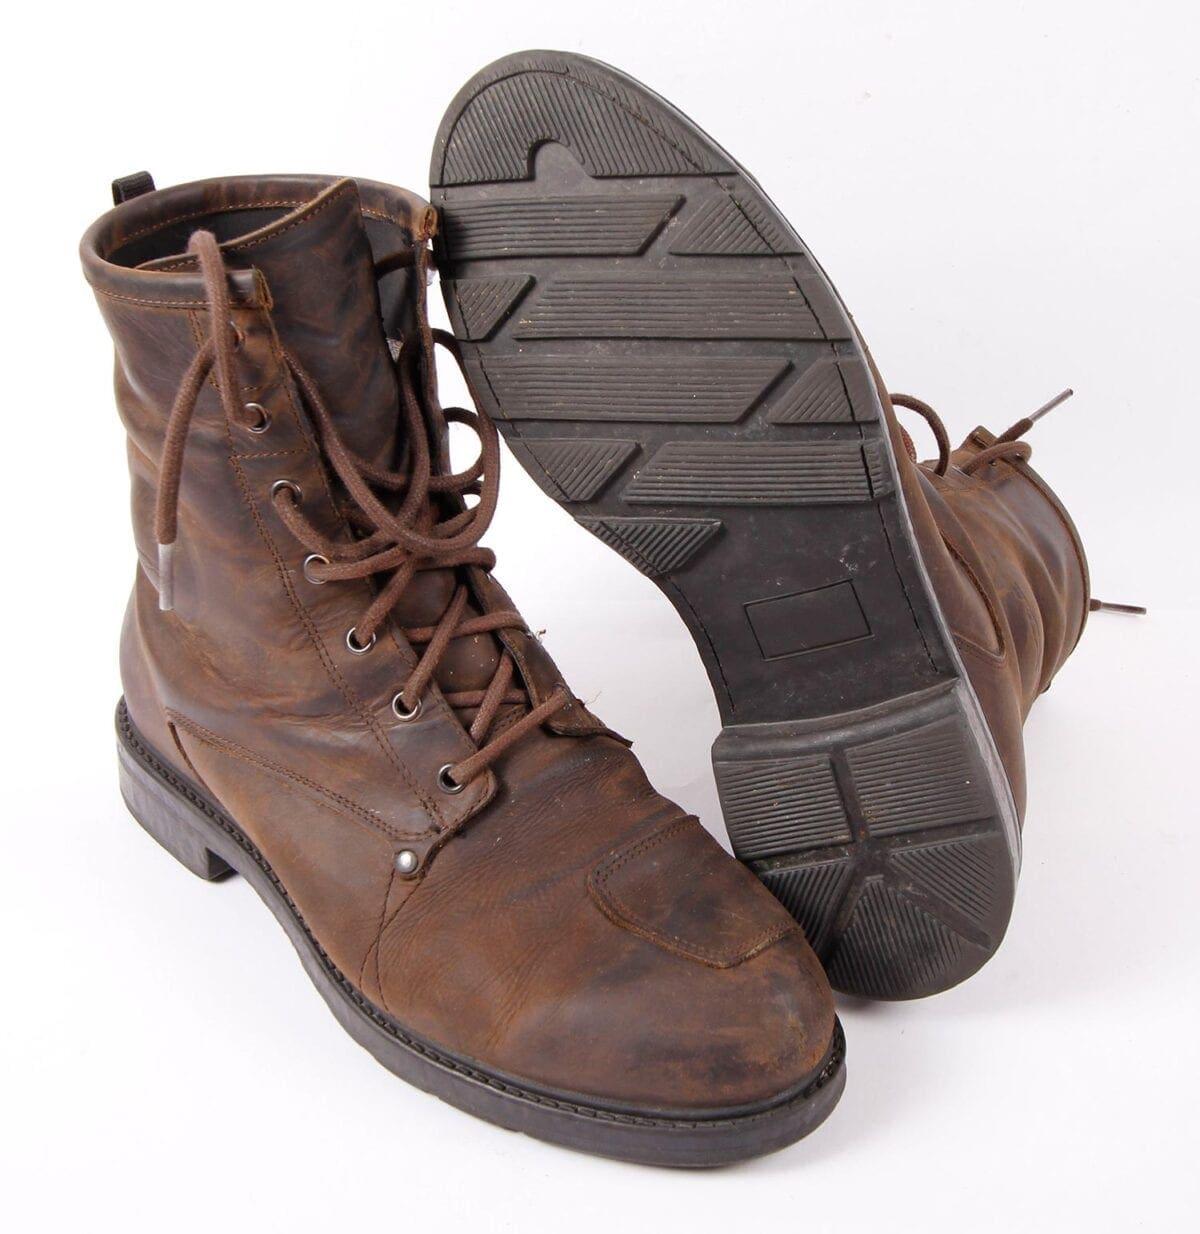 102_TCX-XBlend-boots_002